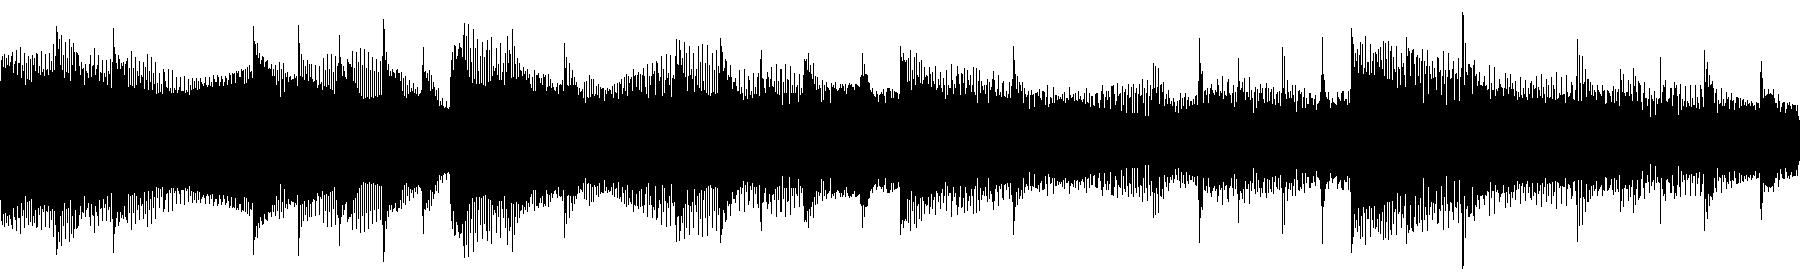 vedh melodyloop 044 am g em f 120bpm